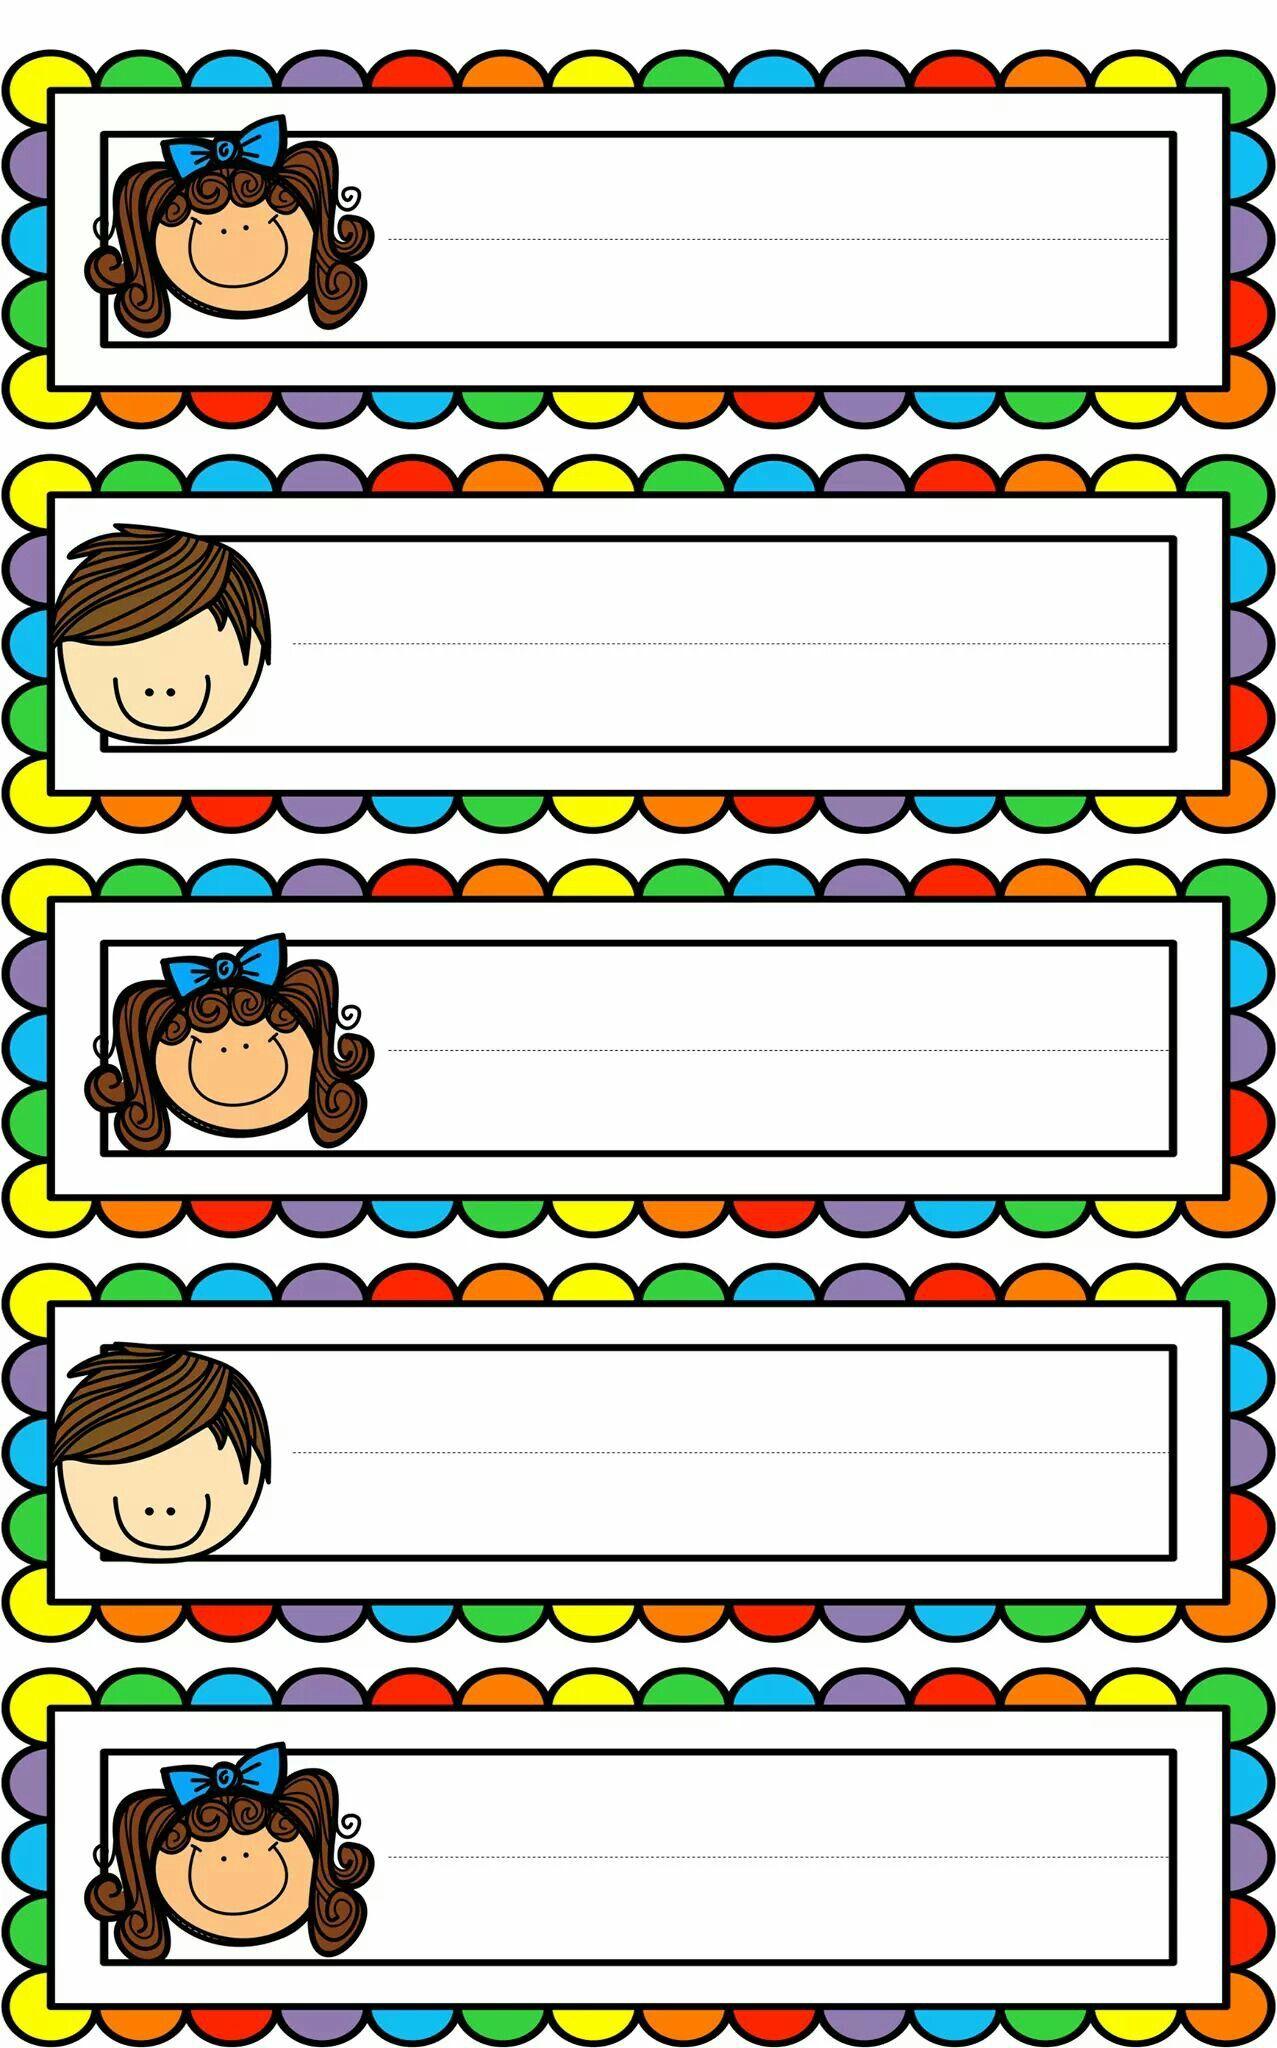 pin by karina cordova on gafet y etiquetas | pinterest | school